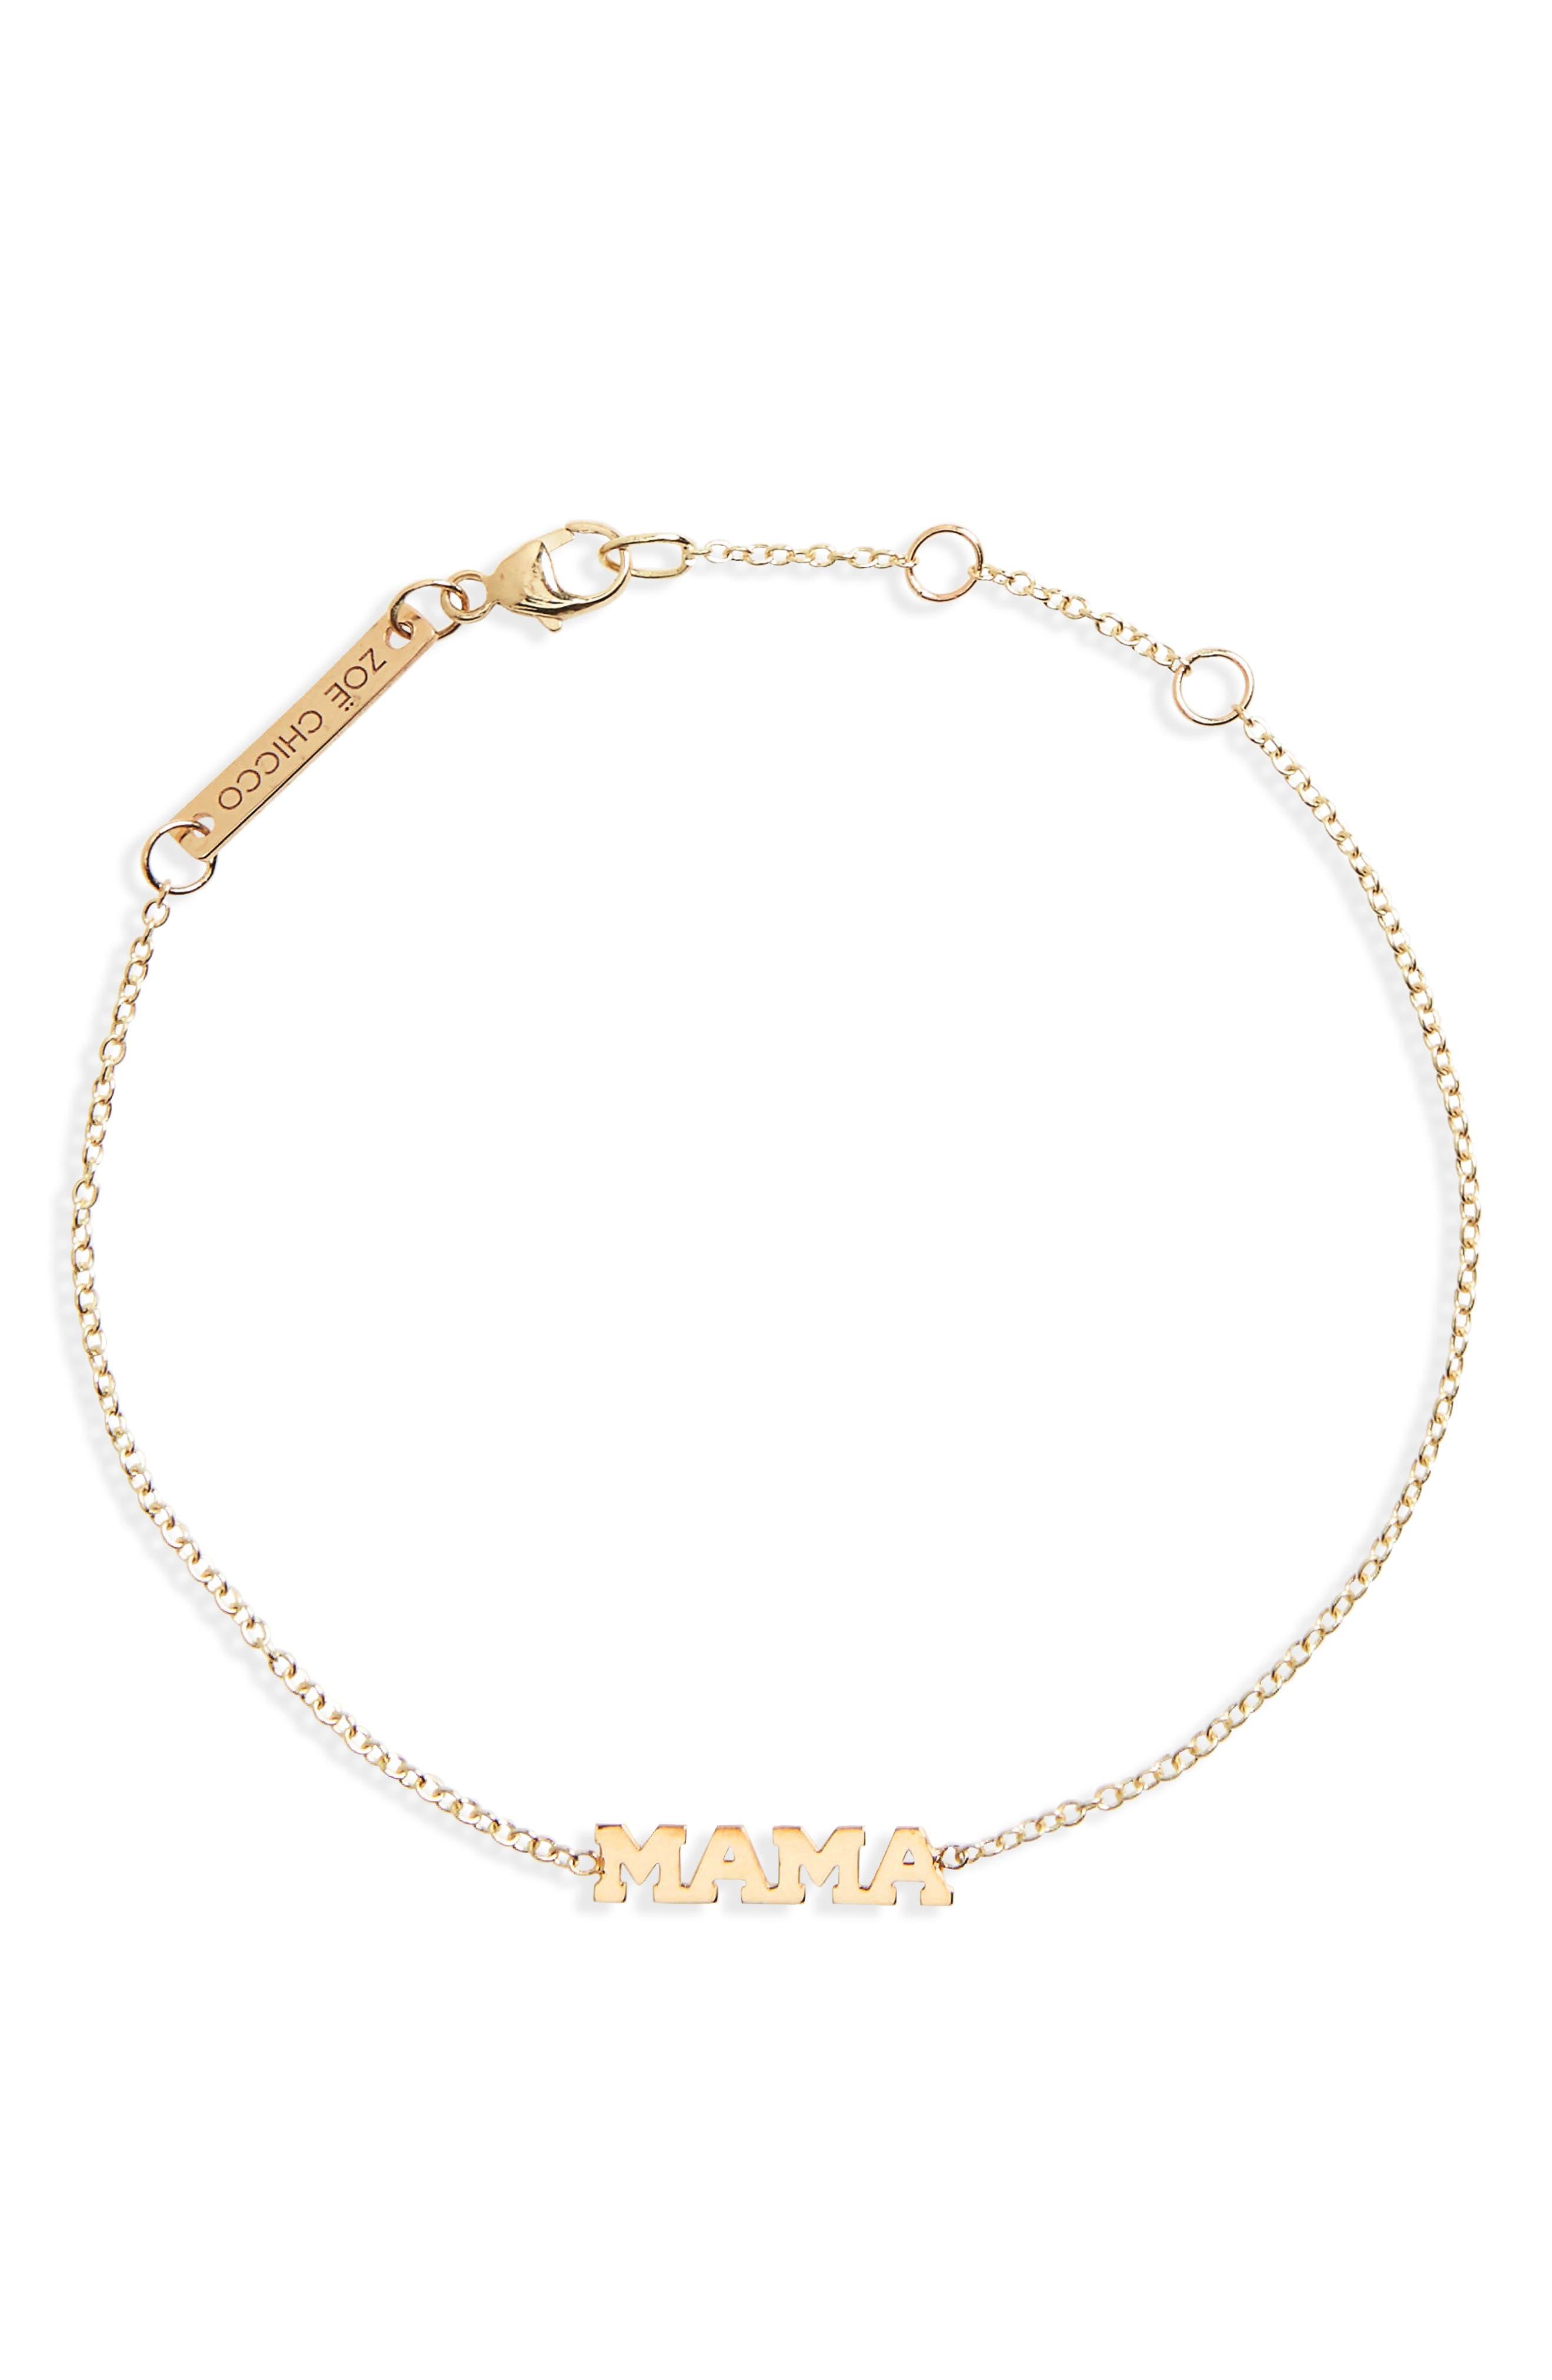 Alternate Image 1 Selected - Zoë Chicco Itty Bitty Mama Bracelet